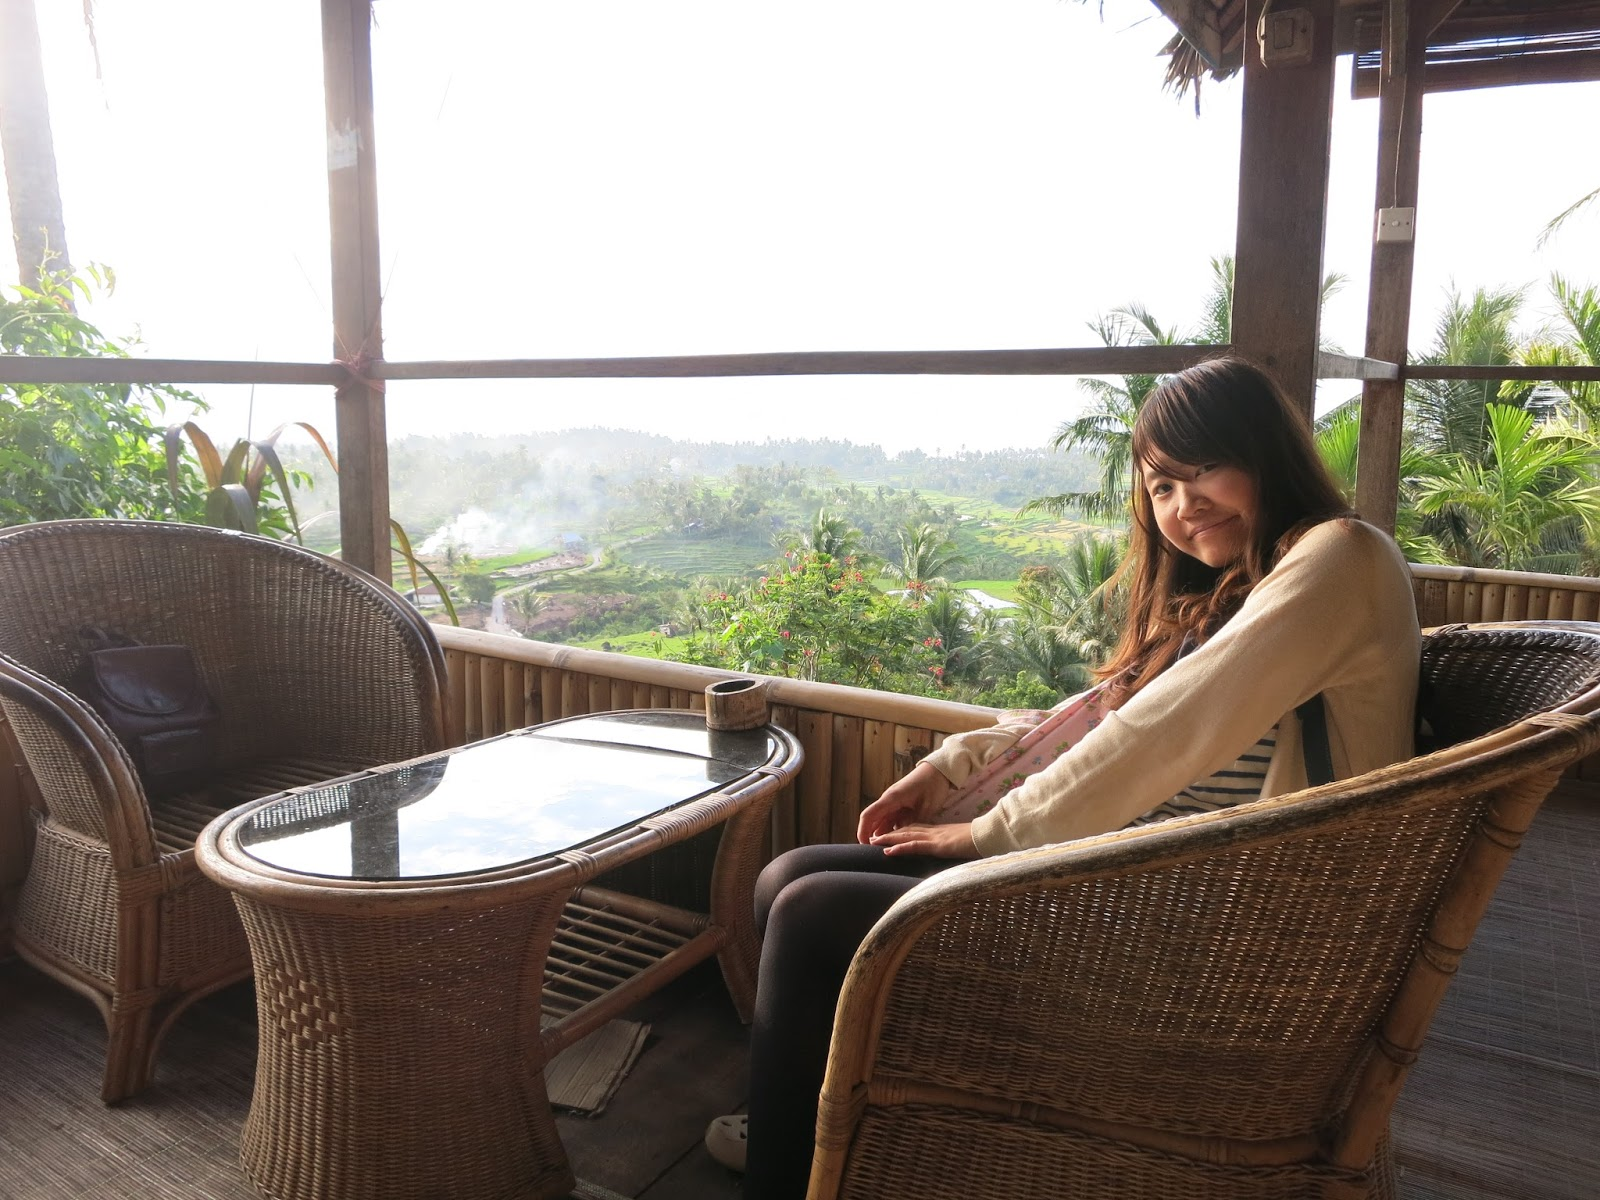 Naomi dari Jepang - Tempat juga dilengkapi kursi dan tempat Sholat